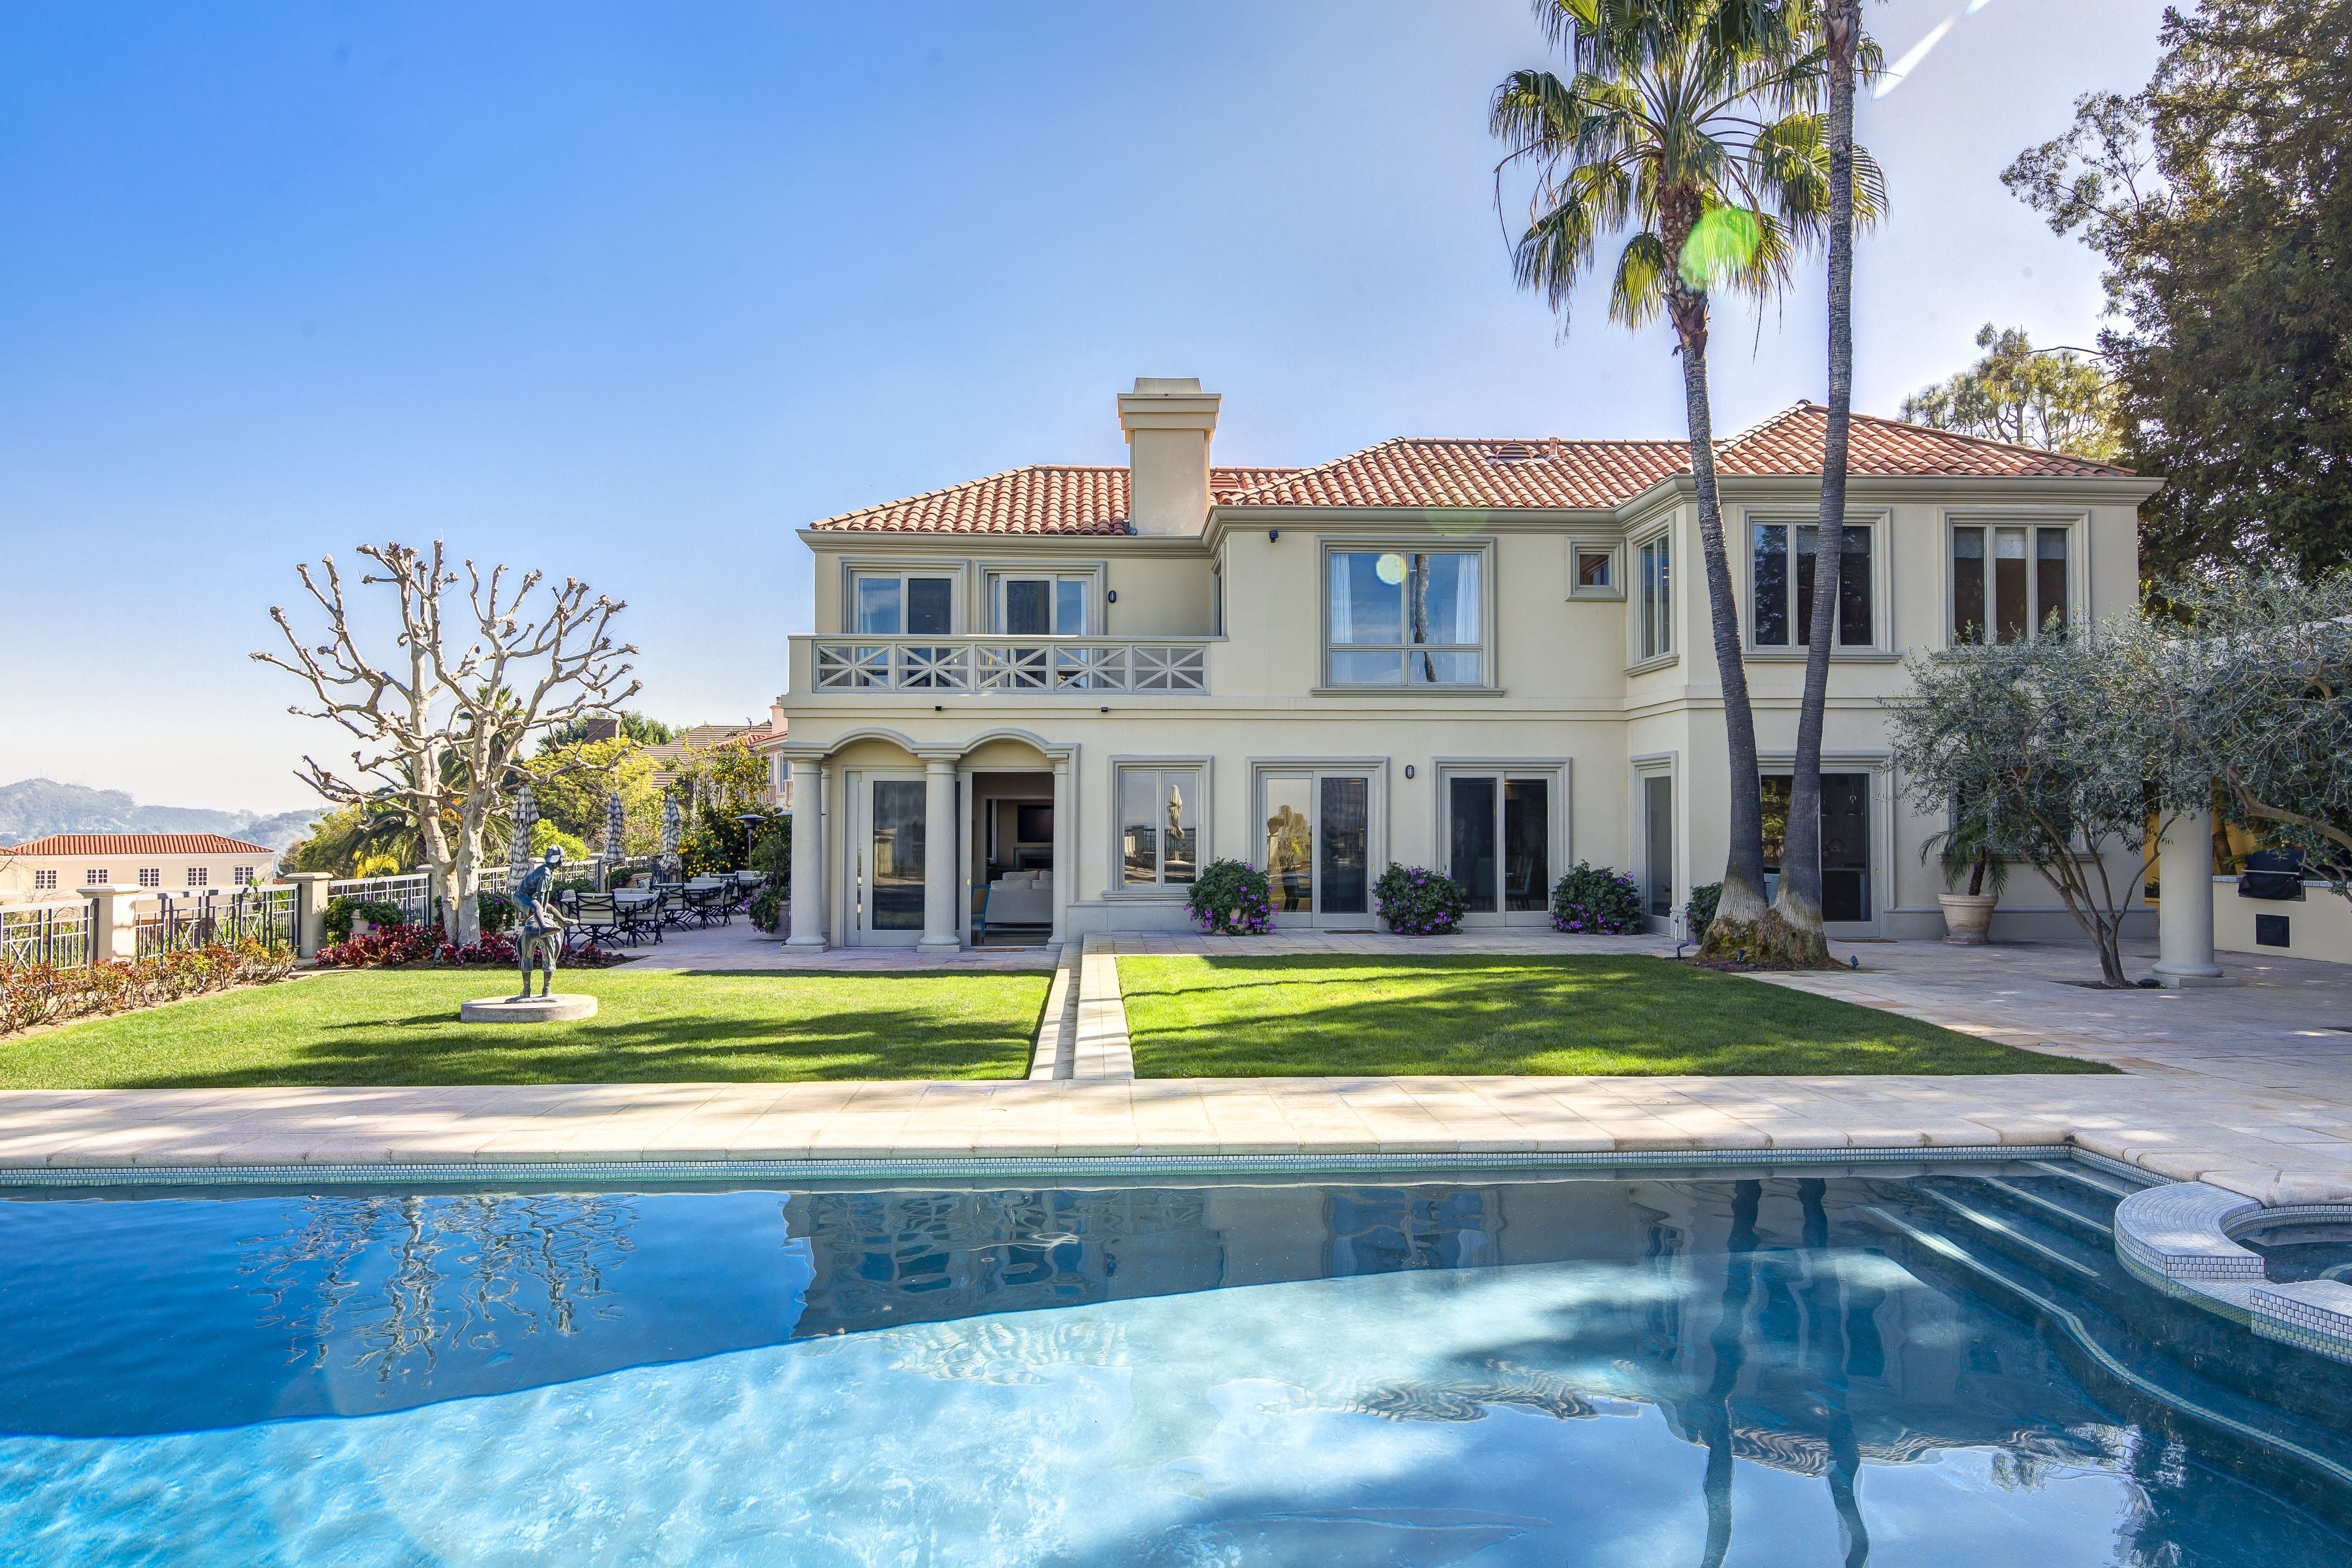 Los Angeles Mansion | Swimming Pool | Spa Pool | Hot Tub | Garden ...